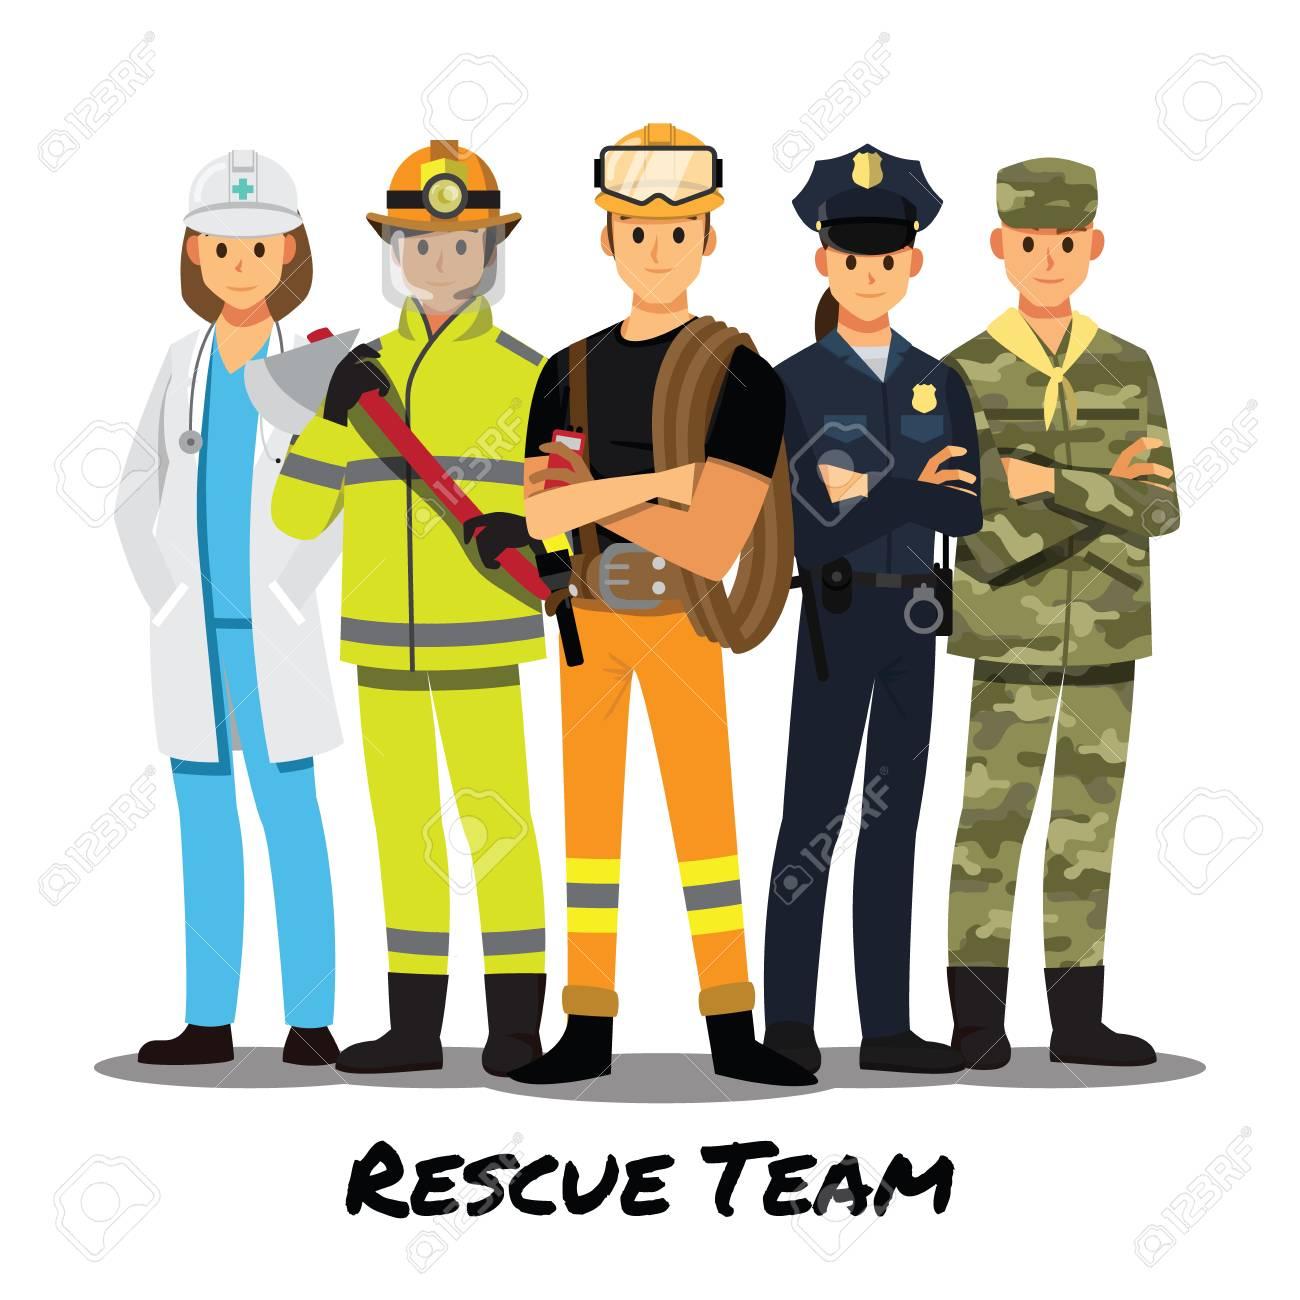 Rescue team cartoon character. - 108190960